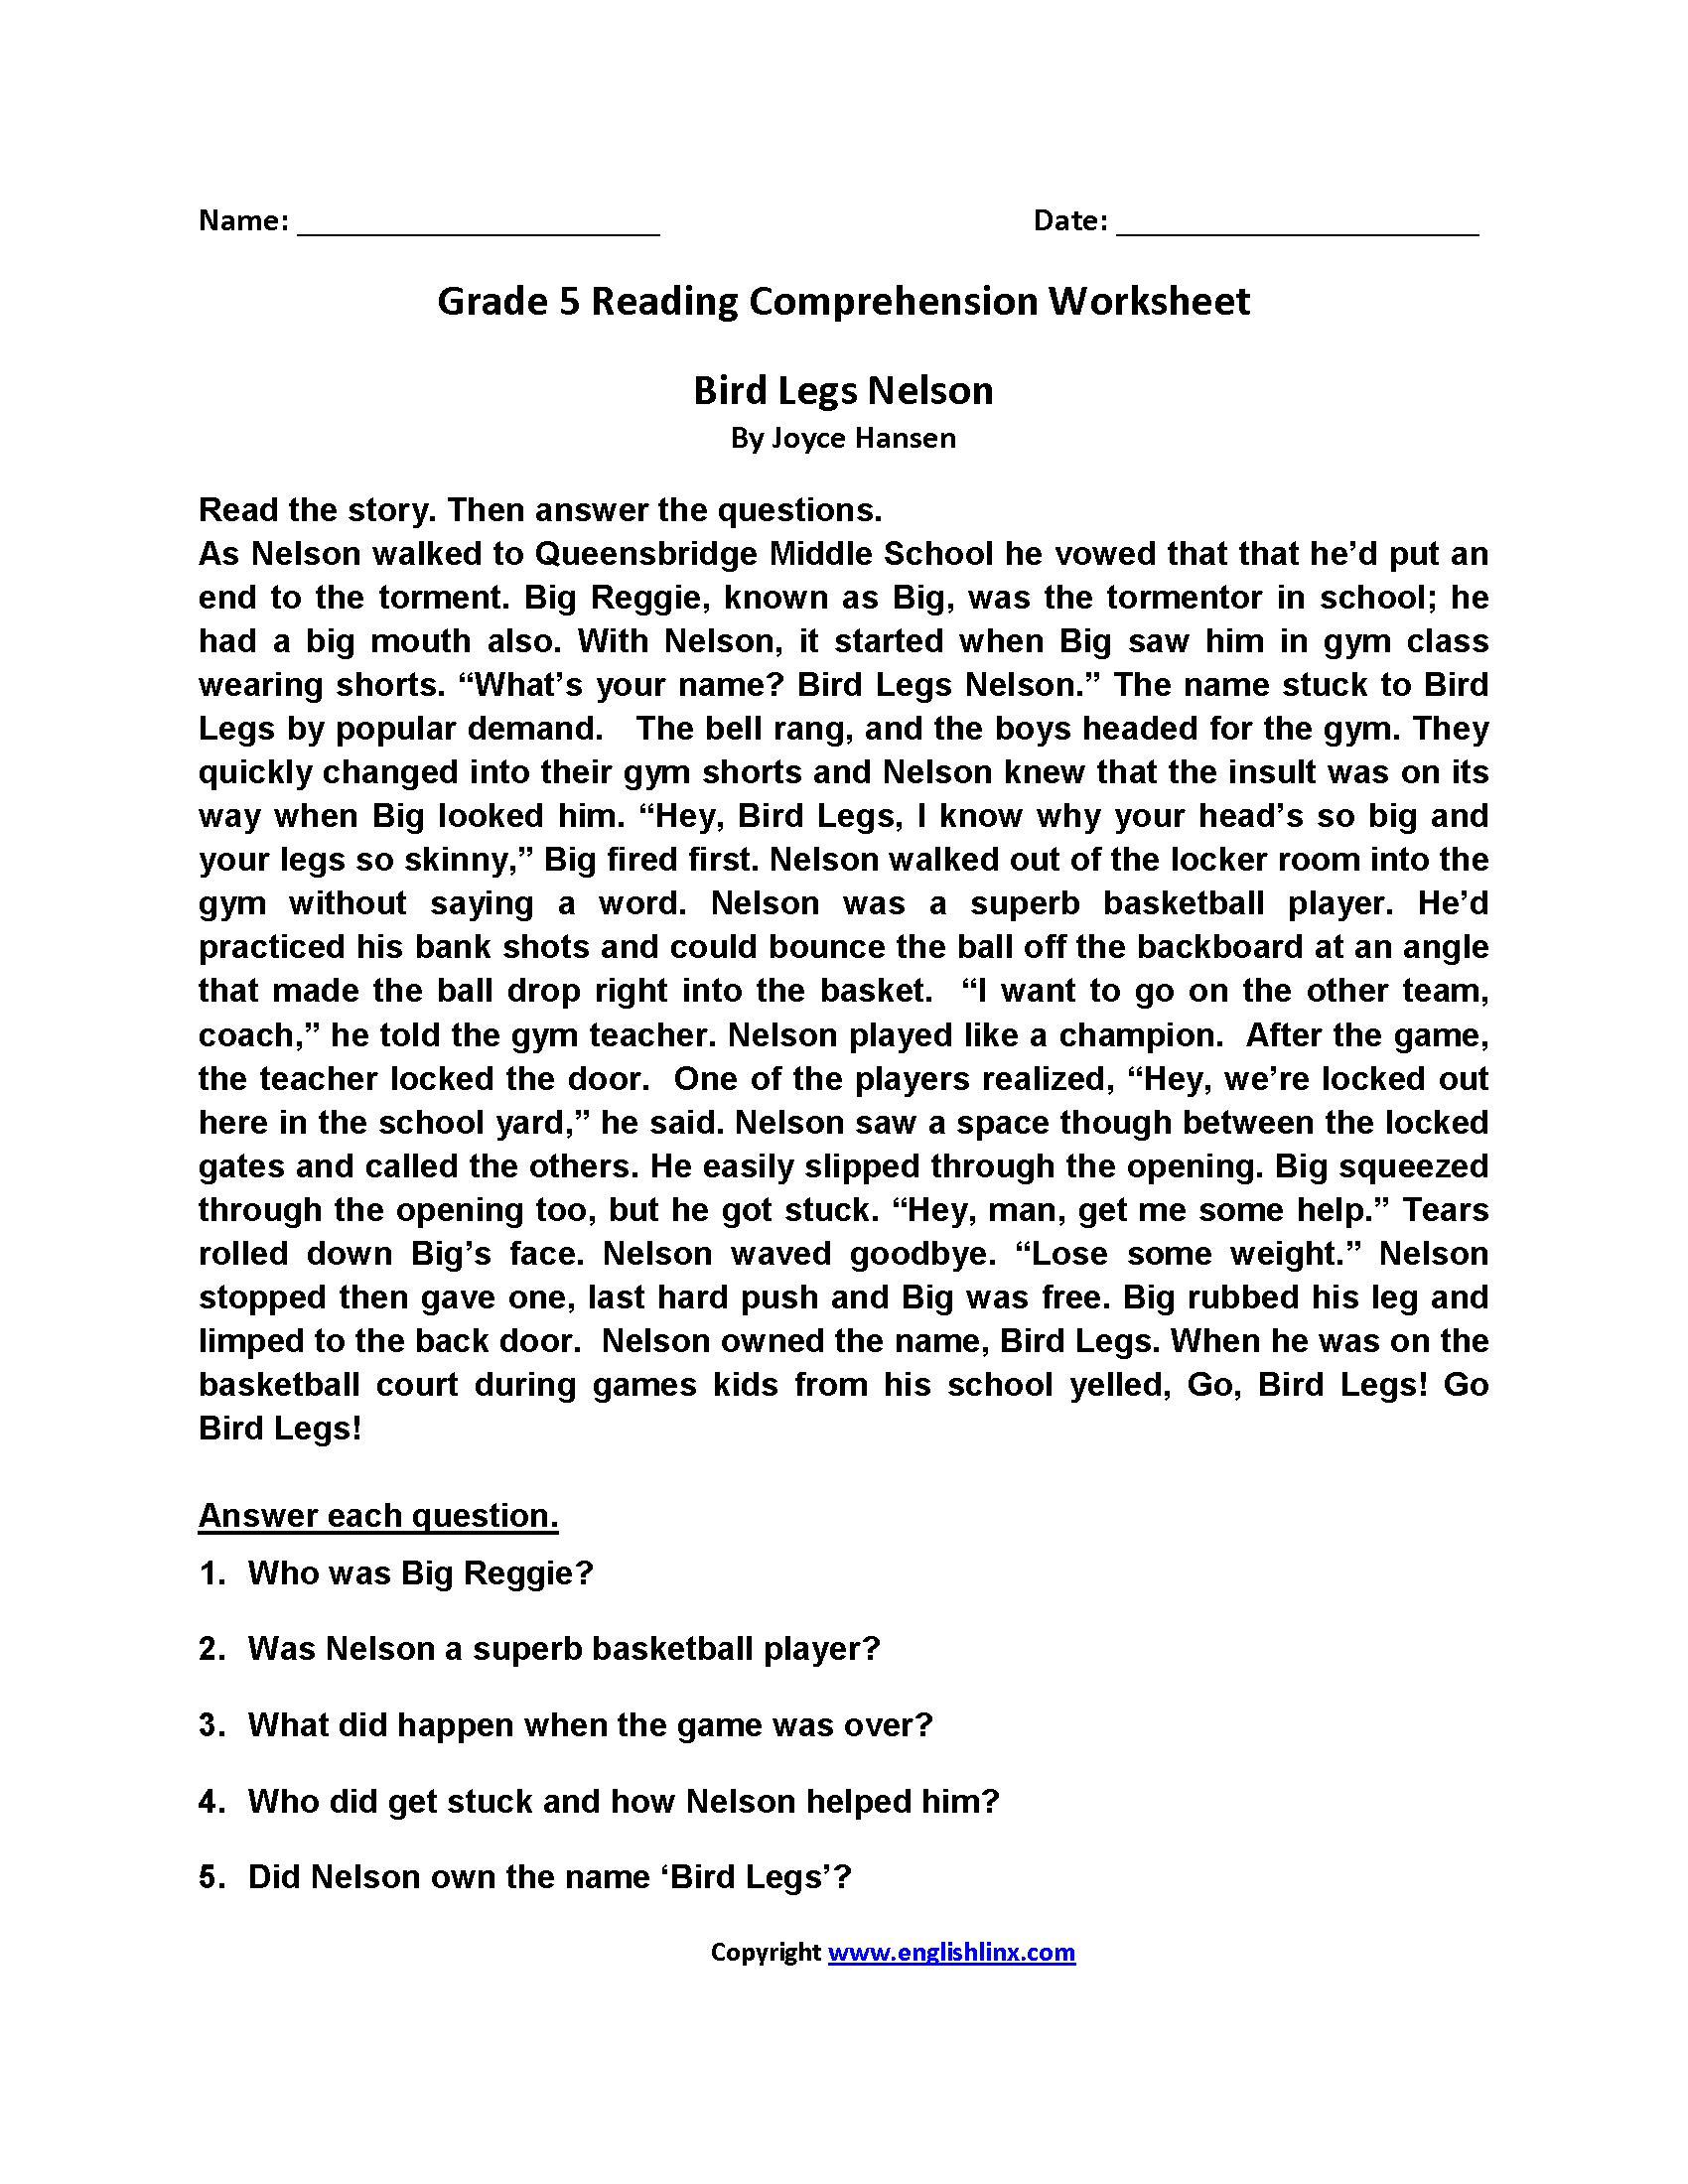 Reading Worksheets | Fifth Grade Reading Worksheets - Free Printable Reading Comprehension Worksheets Grade 5